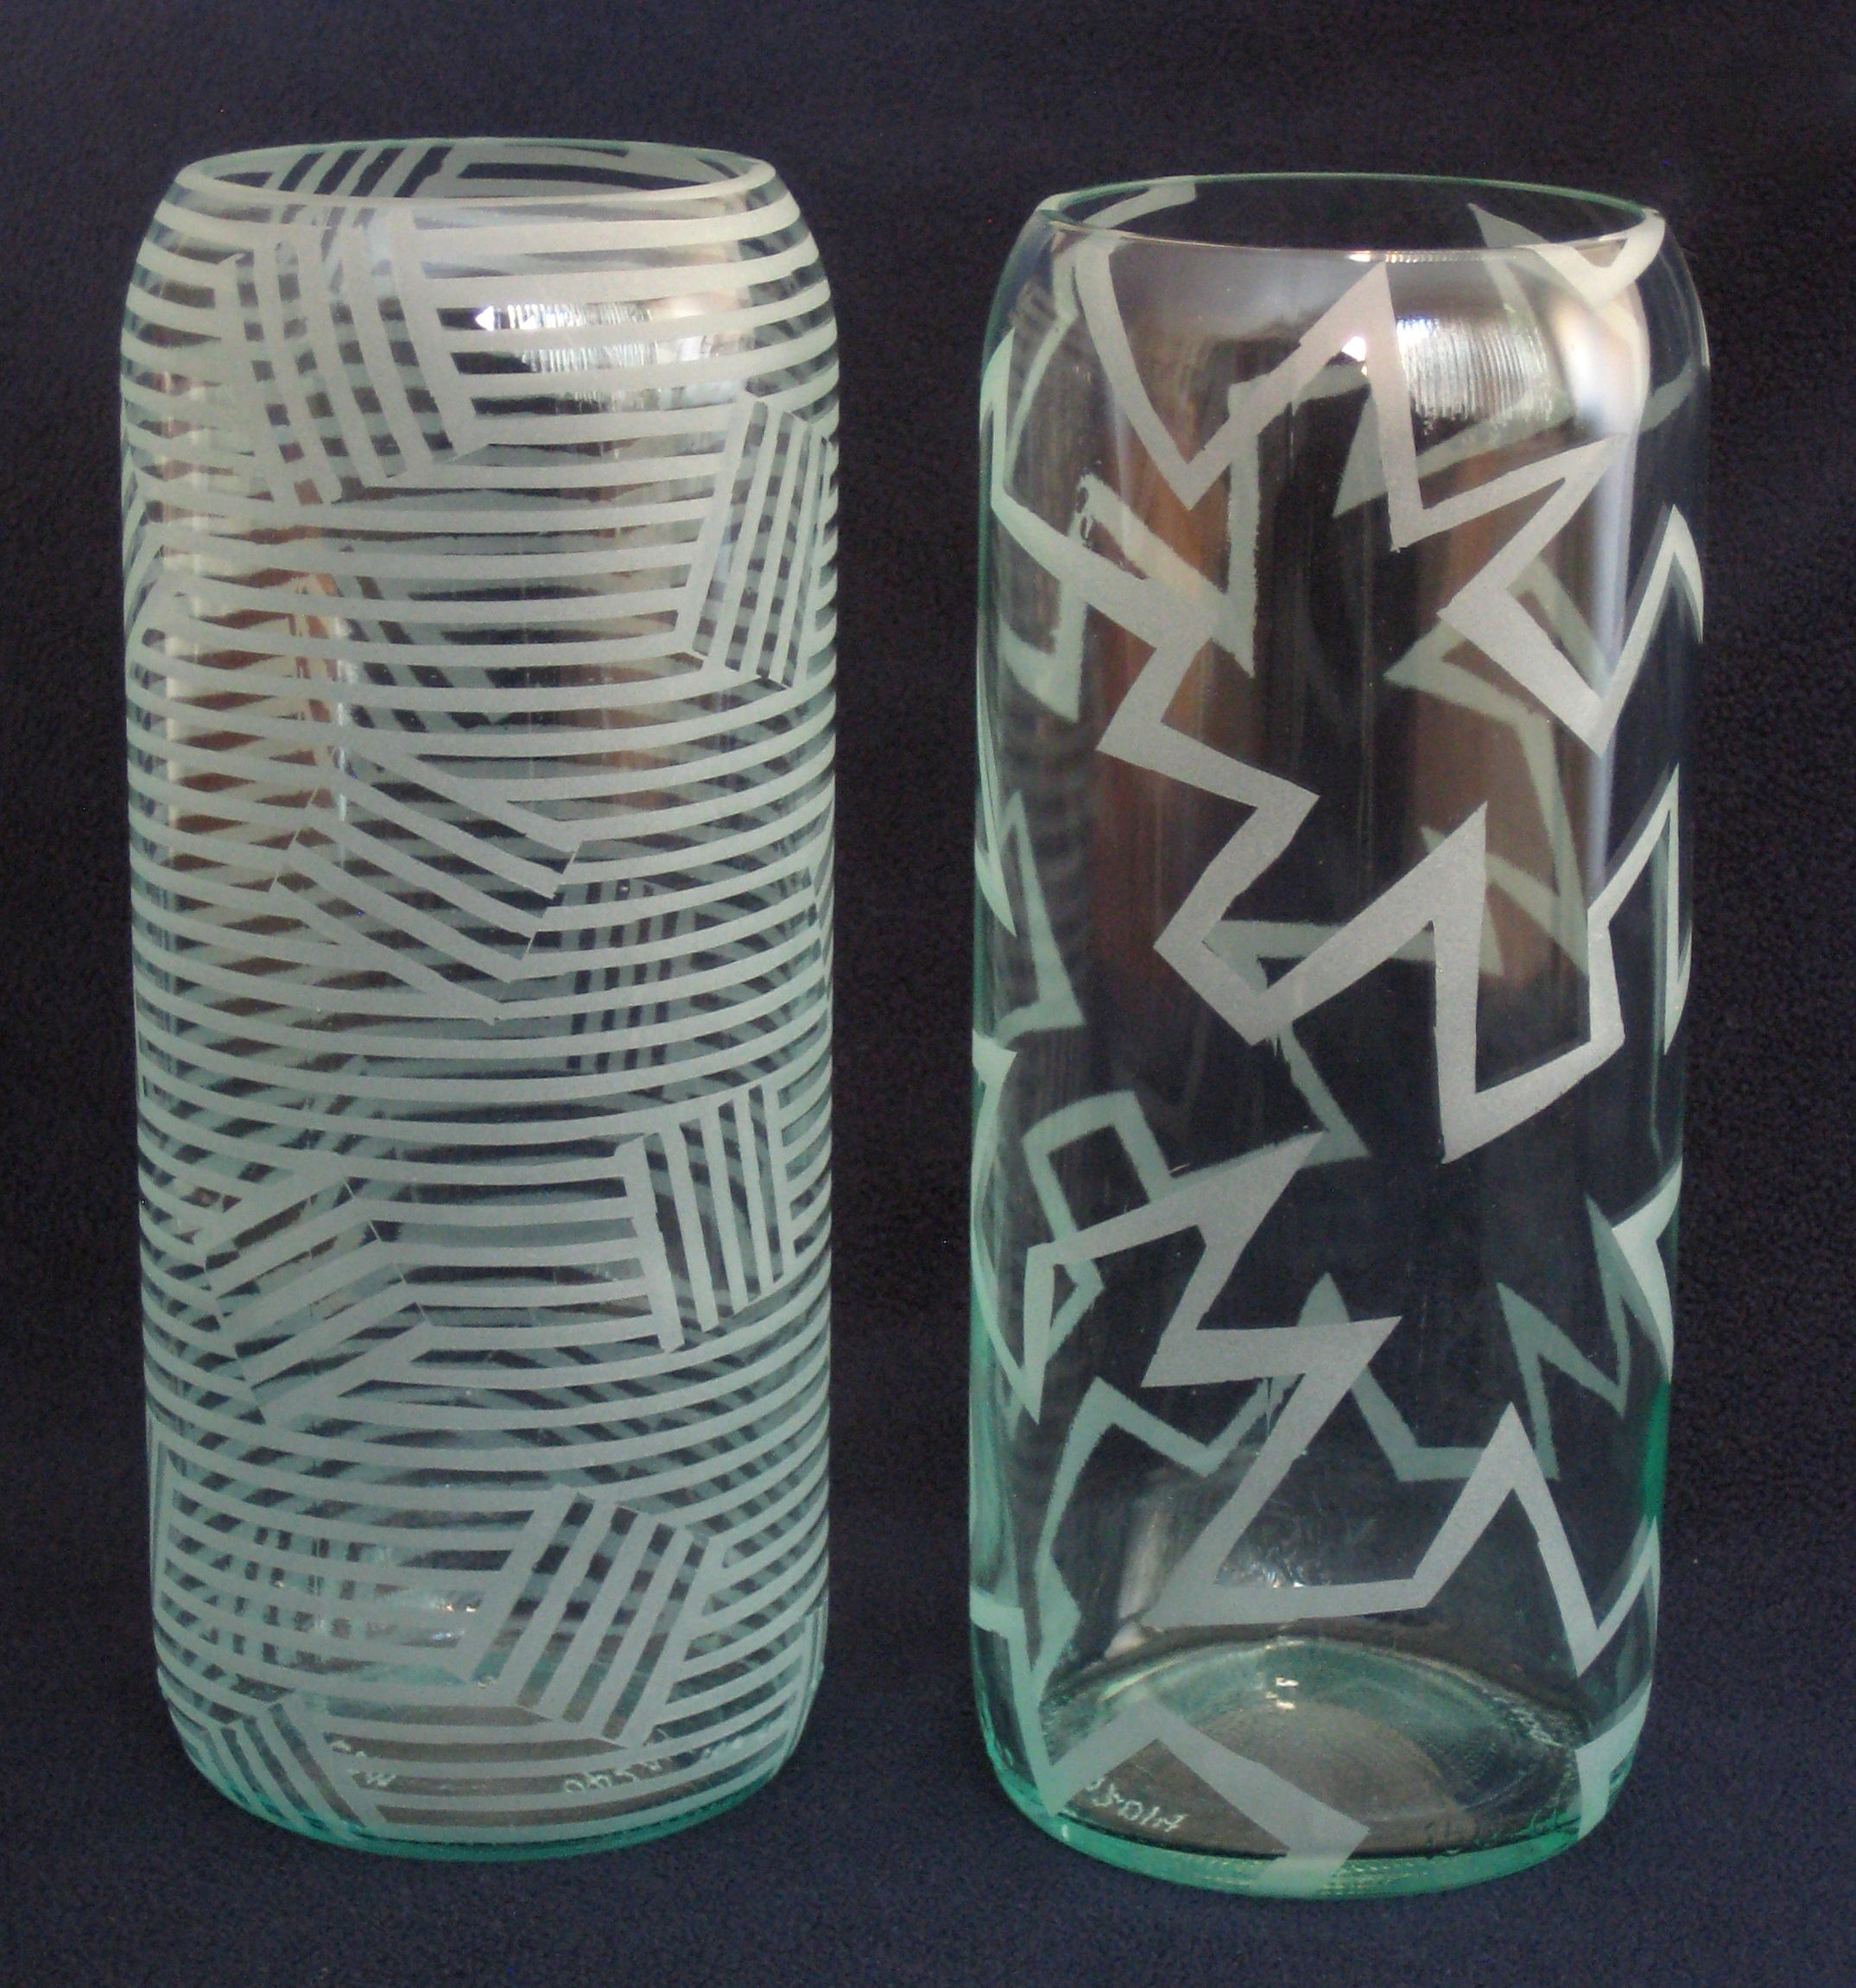 Stripy Tiles - Sold / Lightning Spiral - $60